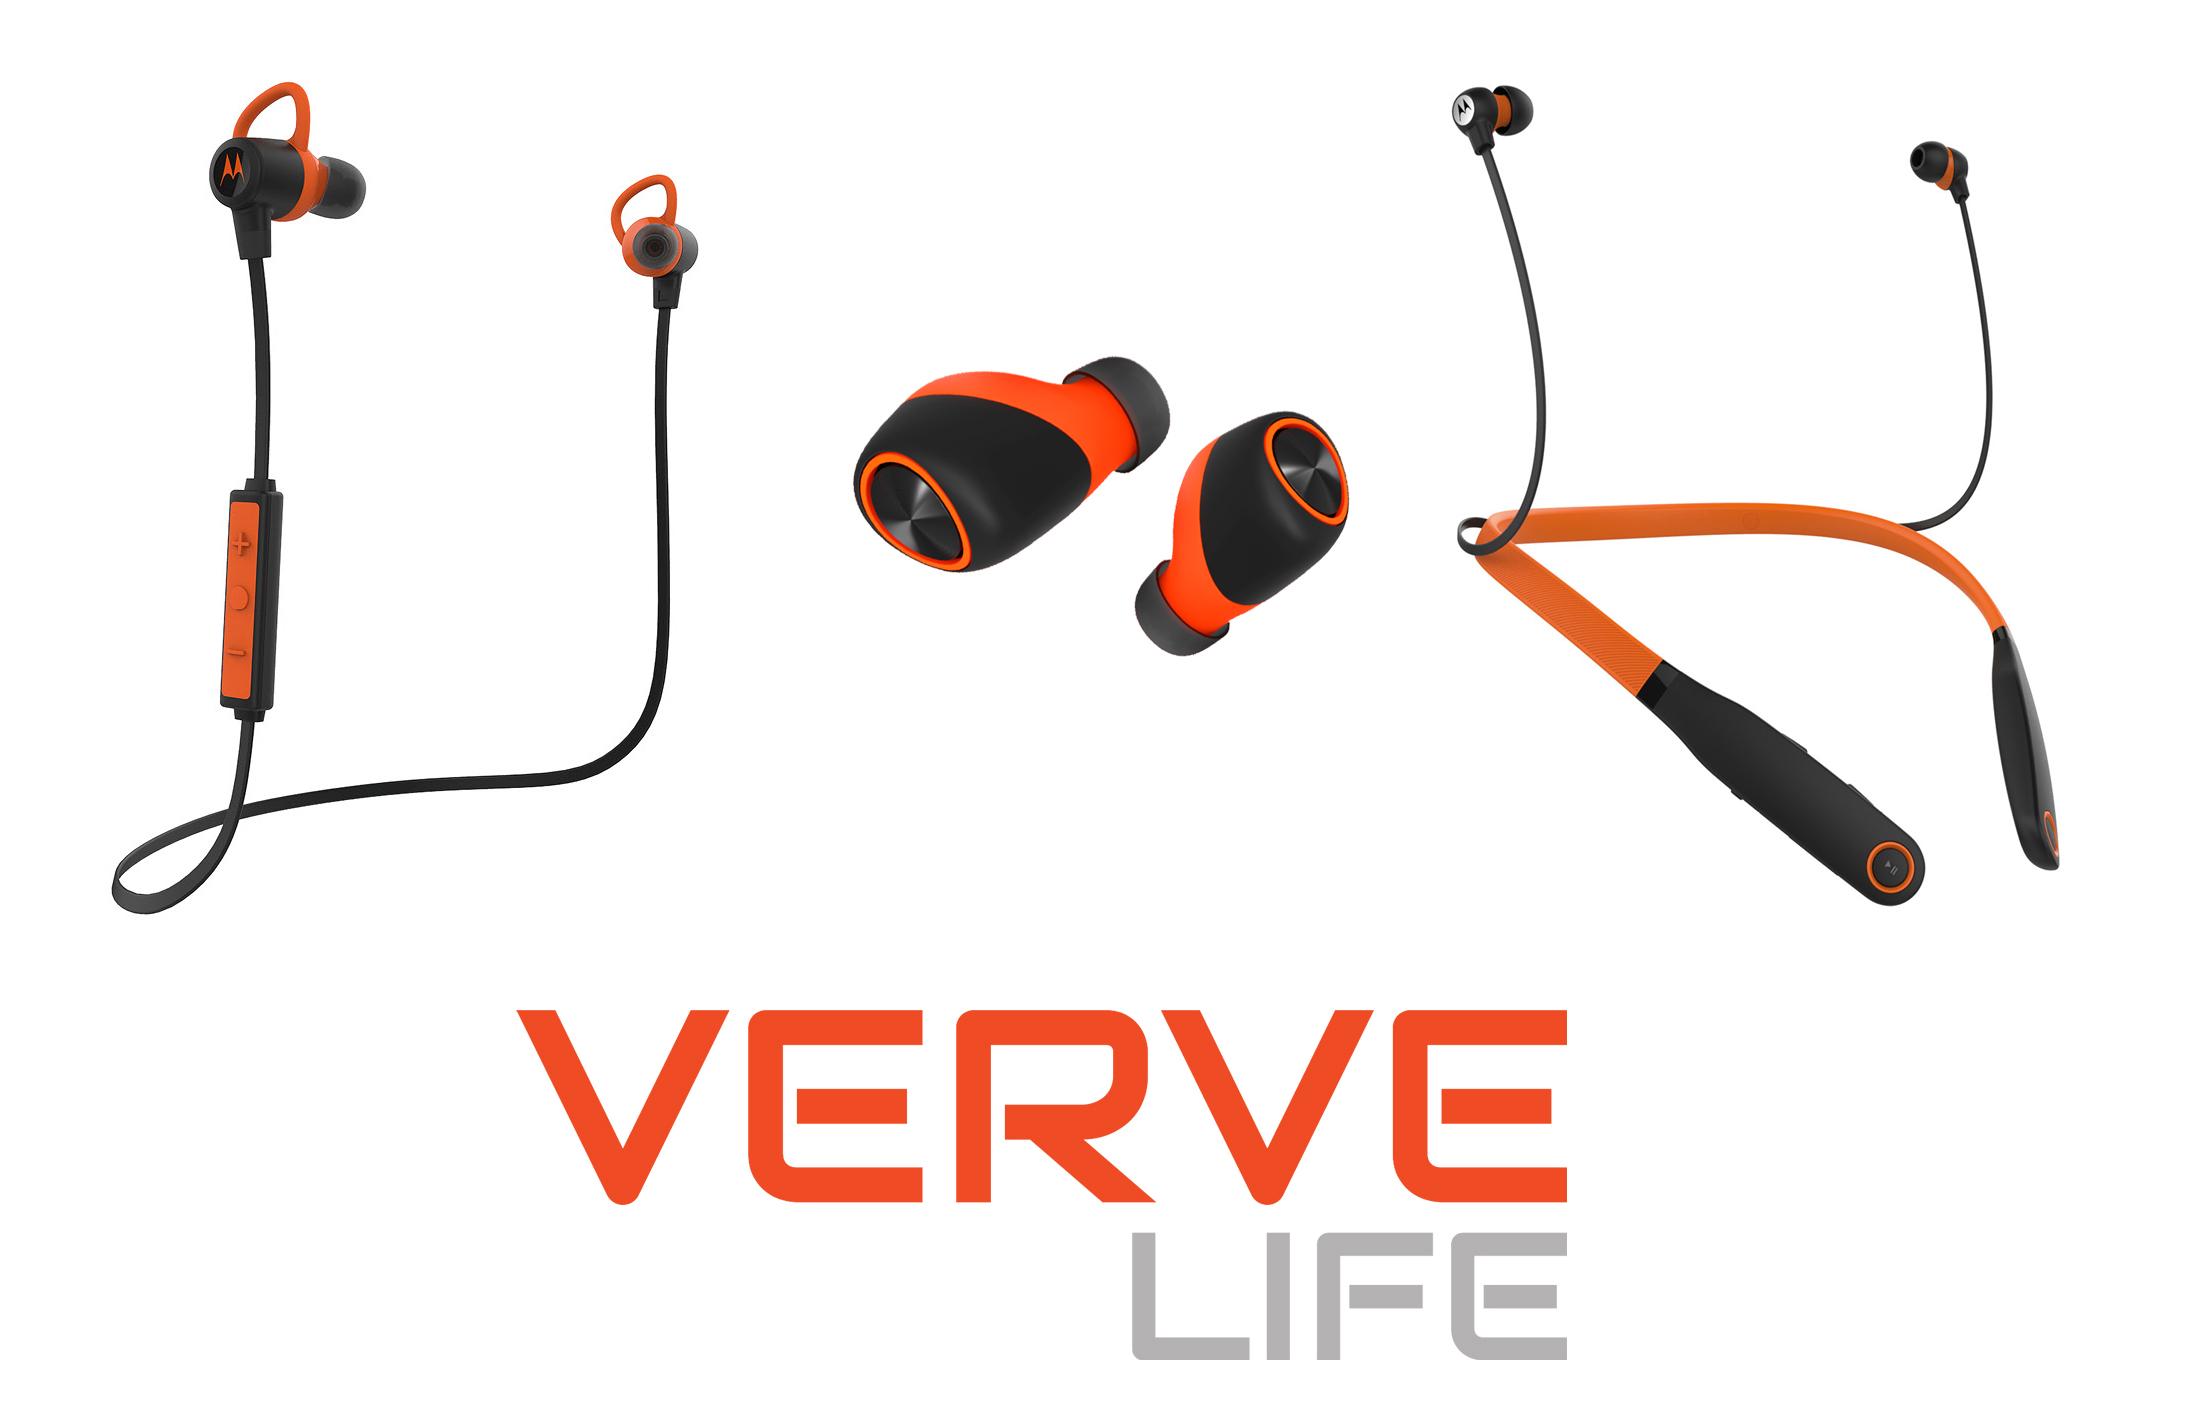 VerveLife Produktfamilie